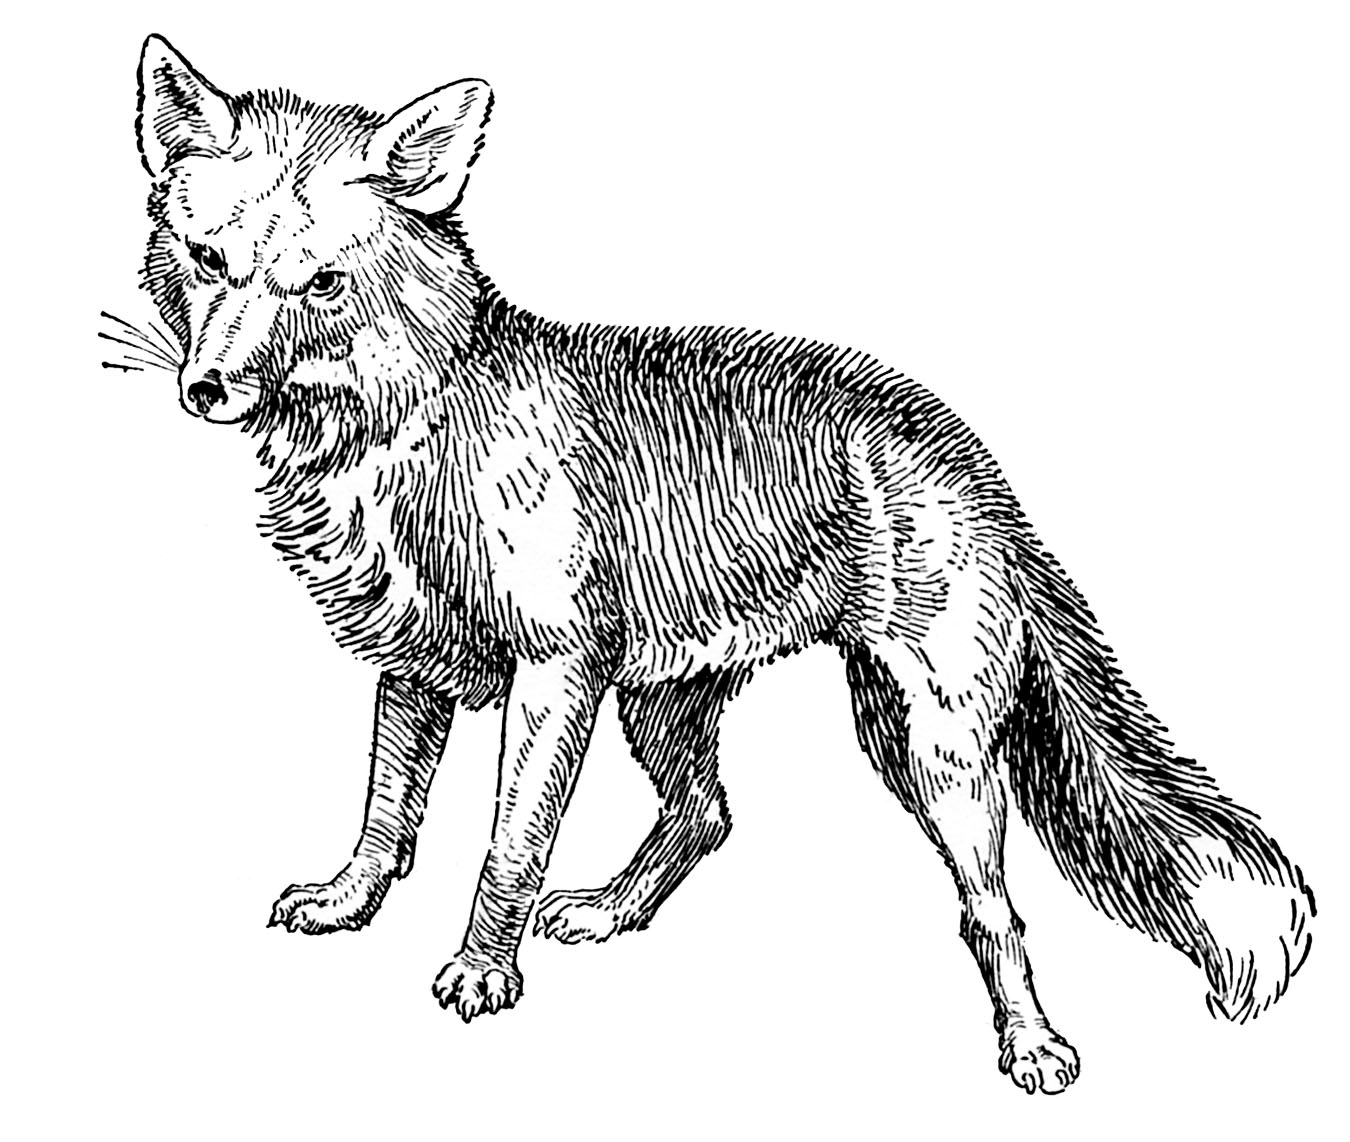 http://3.bp.blogspot.com/-LwnQikLmB-E/Tzaia-ABtqI/AAAAAAAAQi4/Nq9ufh5n2NU/s1600/fox+vintage+image+GraphicsFairy002.jpg